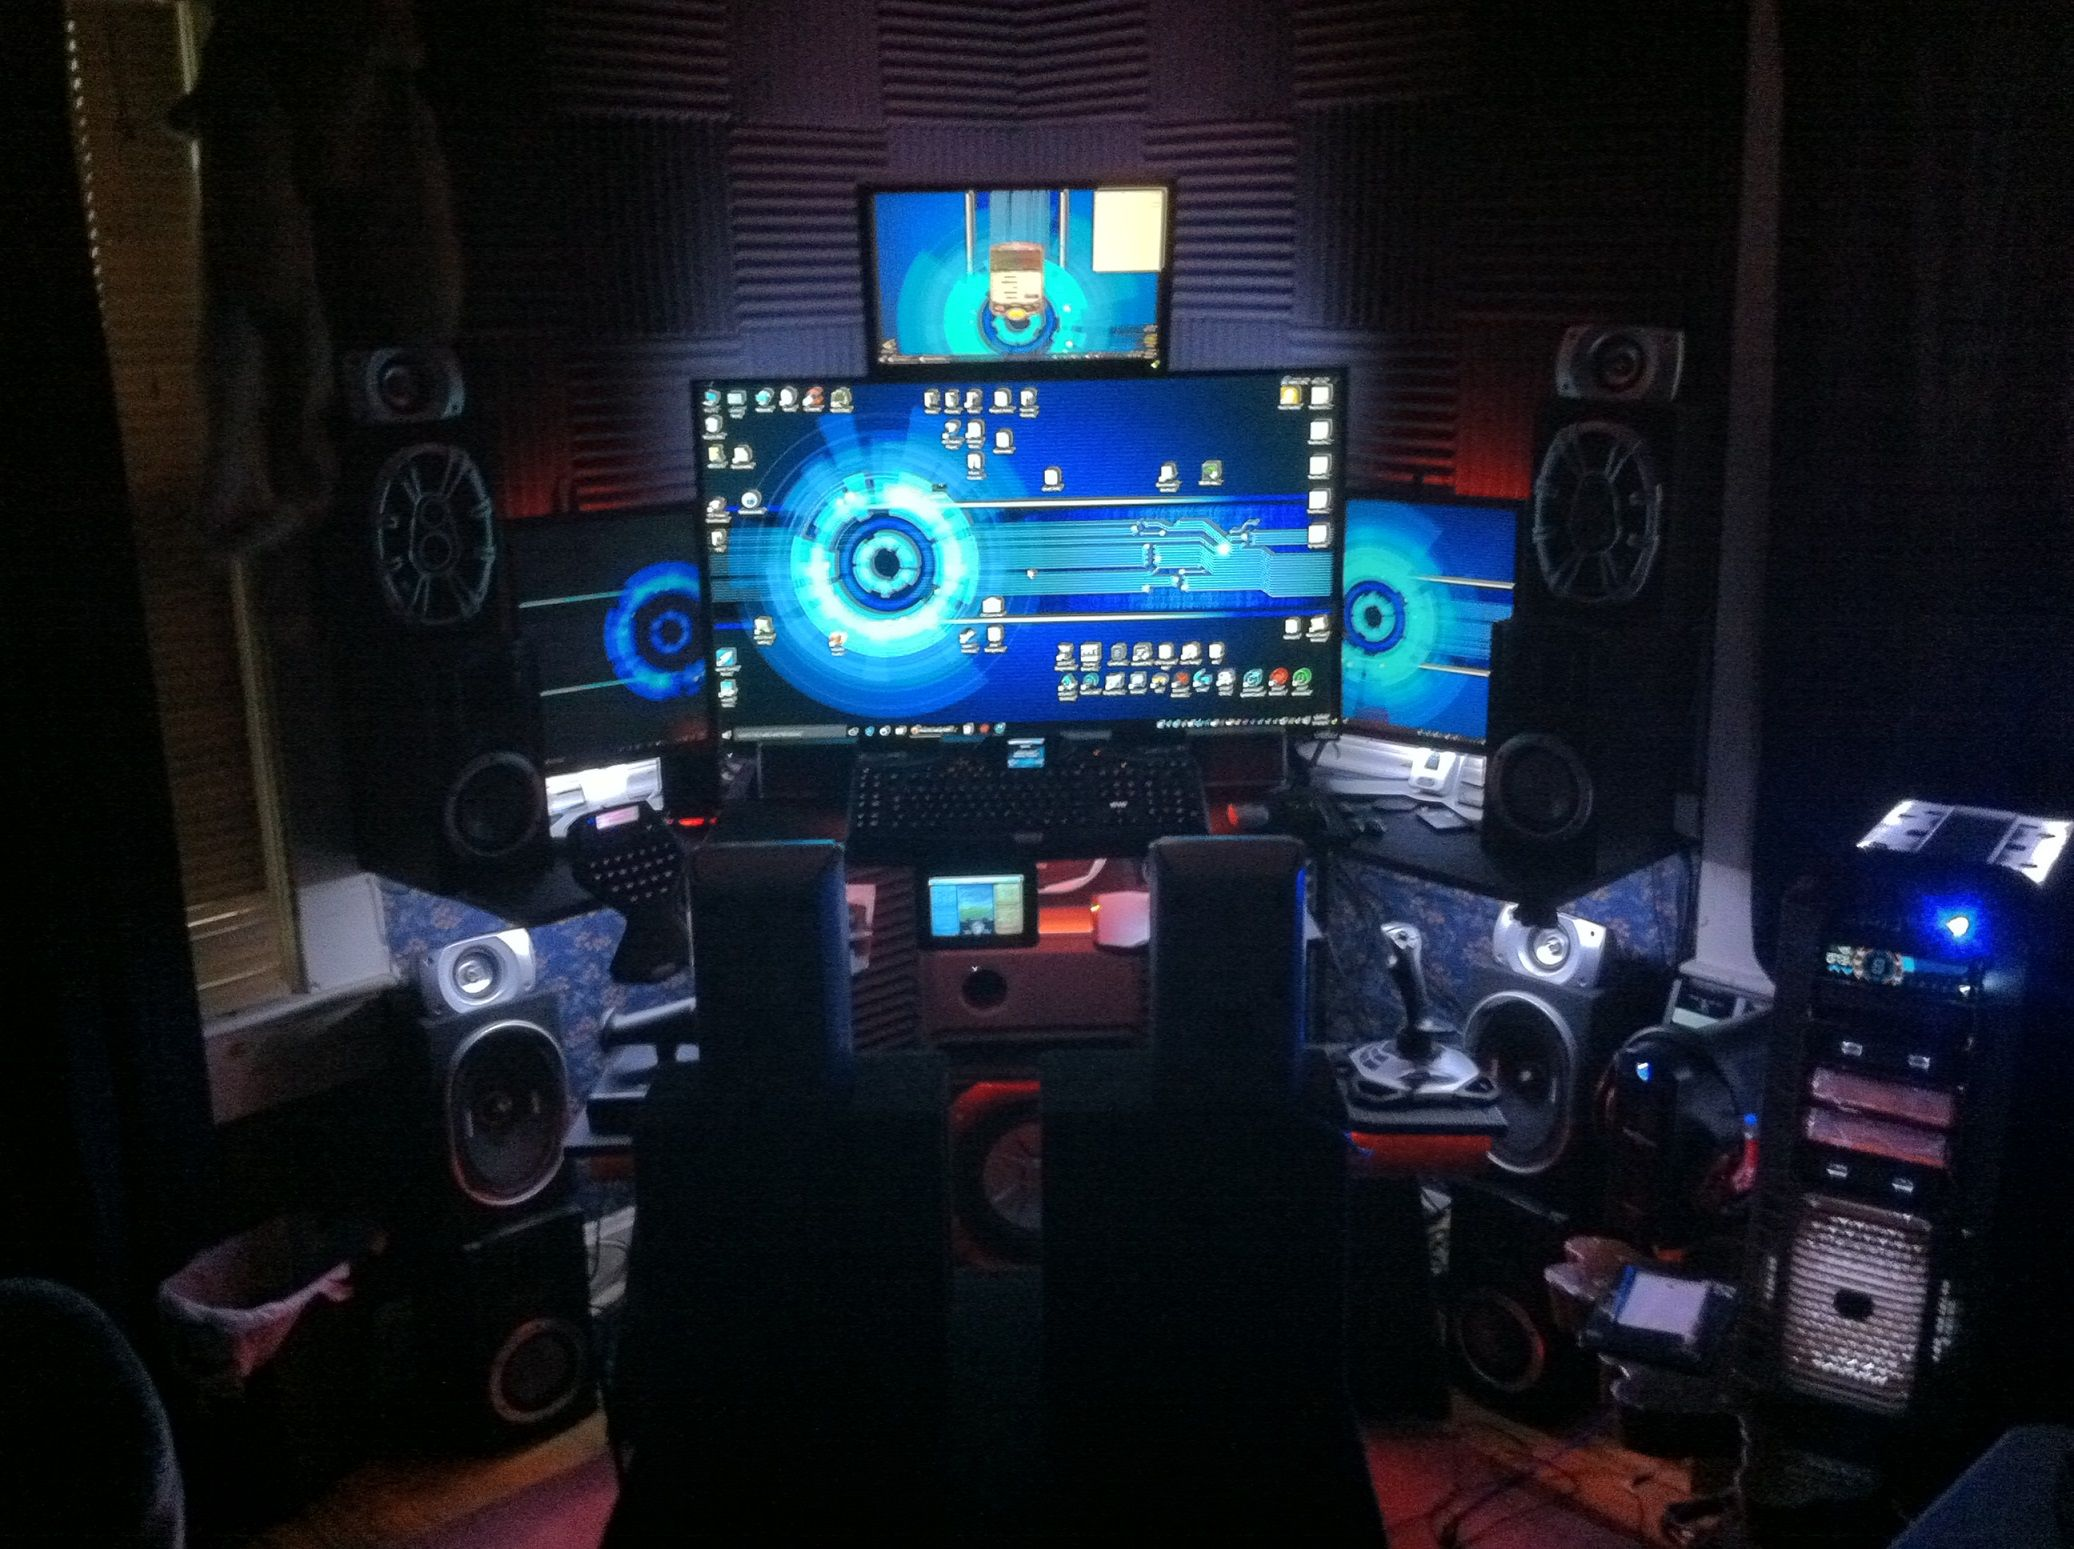 Wire A Car Audio Amp For An Insane Home Audio Setup!